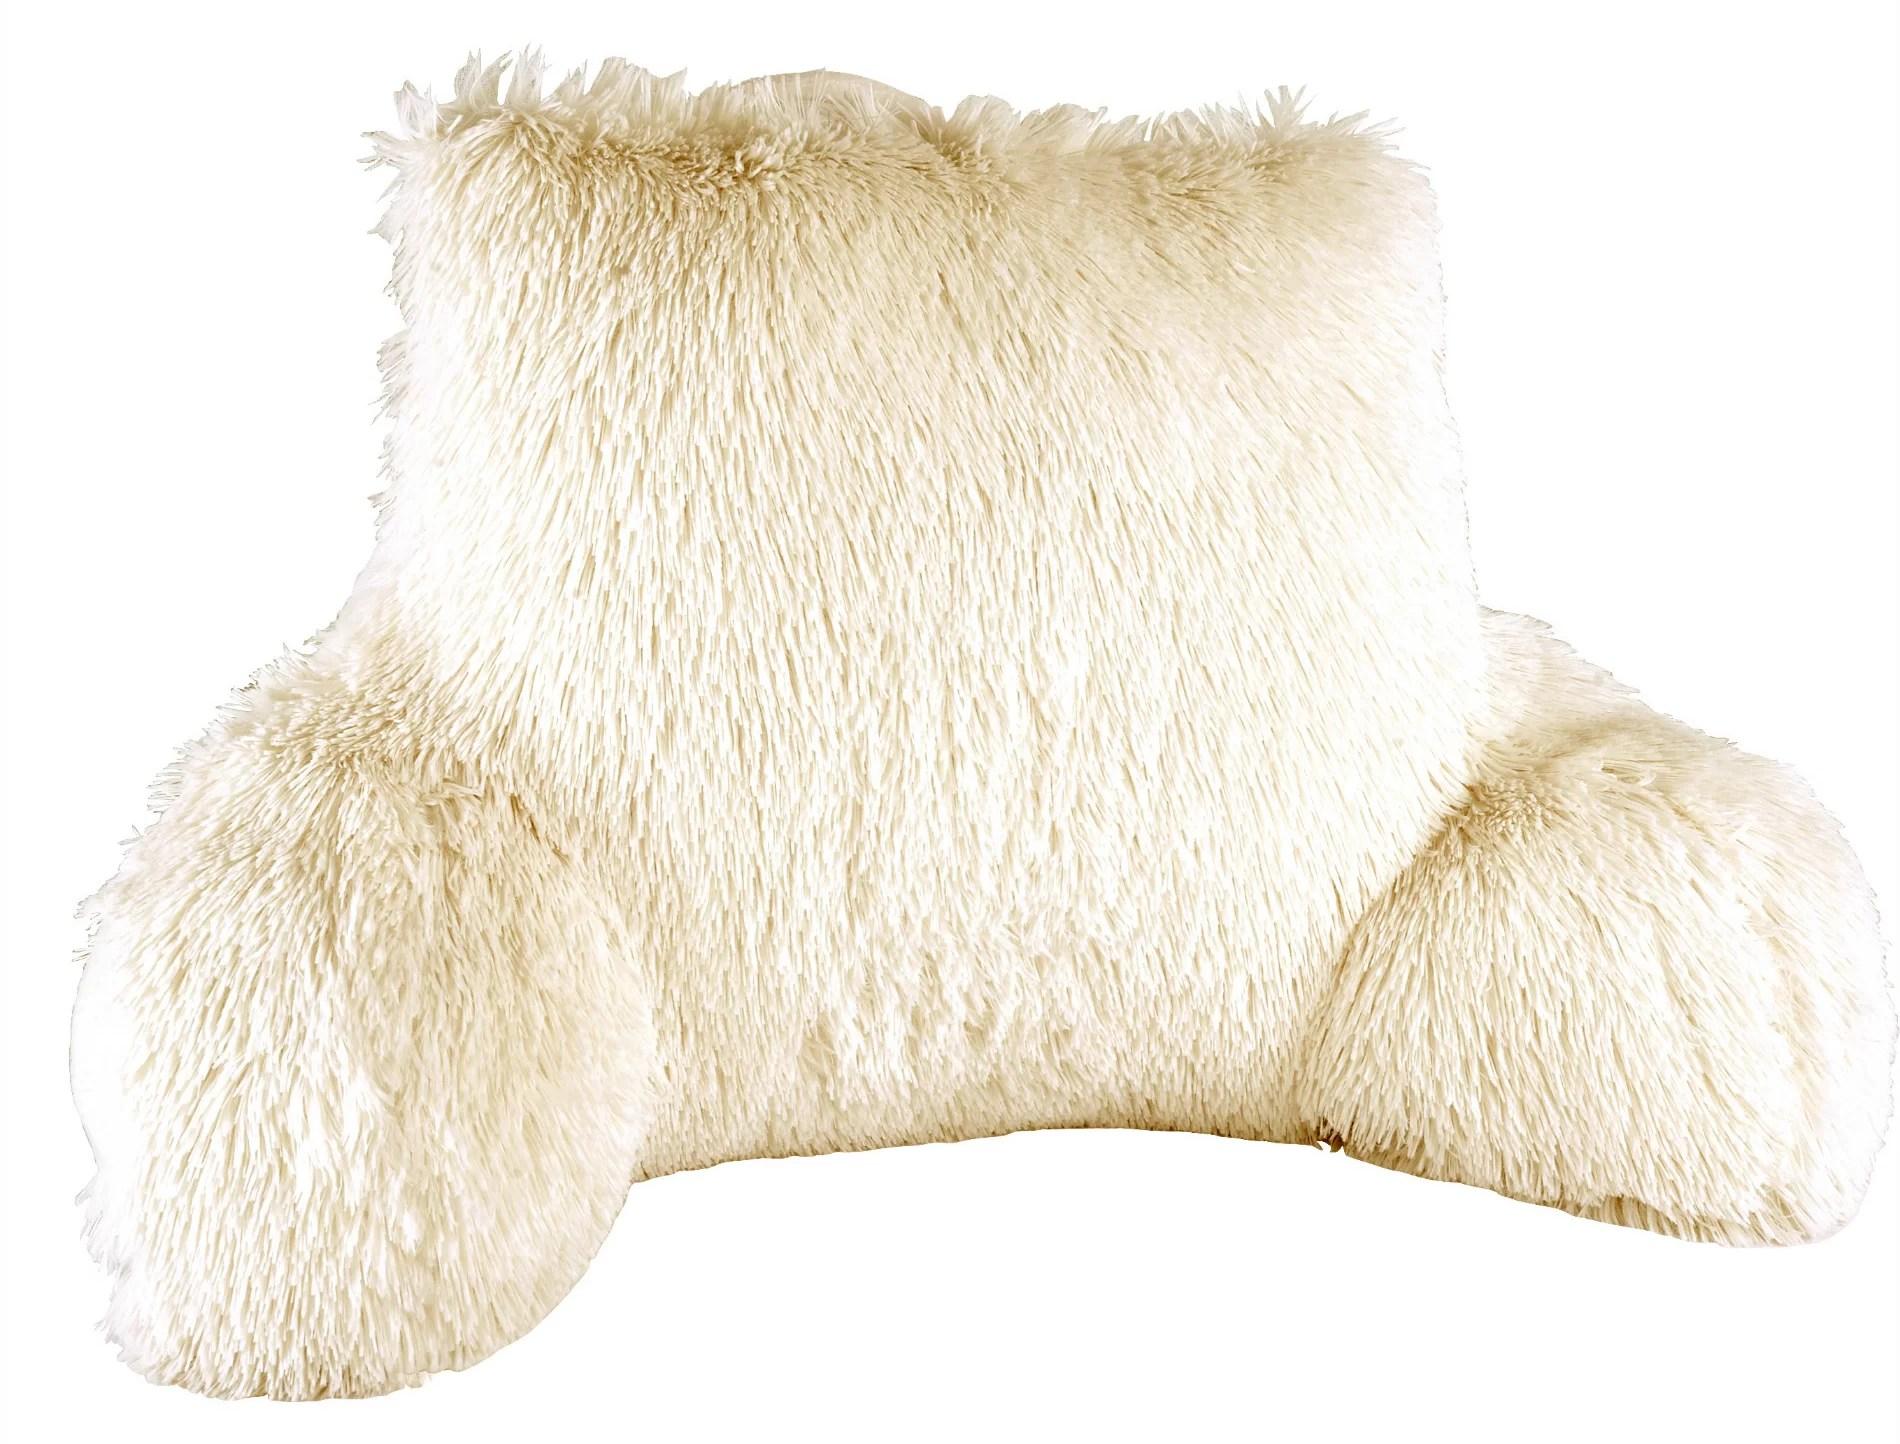 melina shaggy backrest pillow cover insert